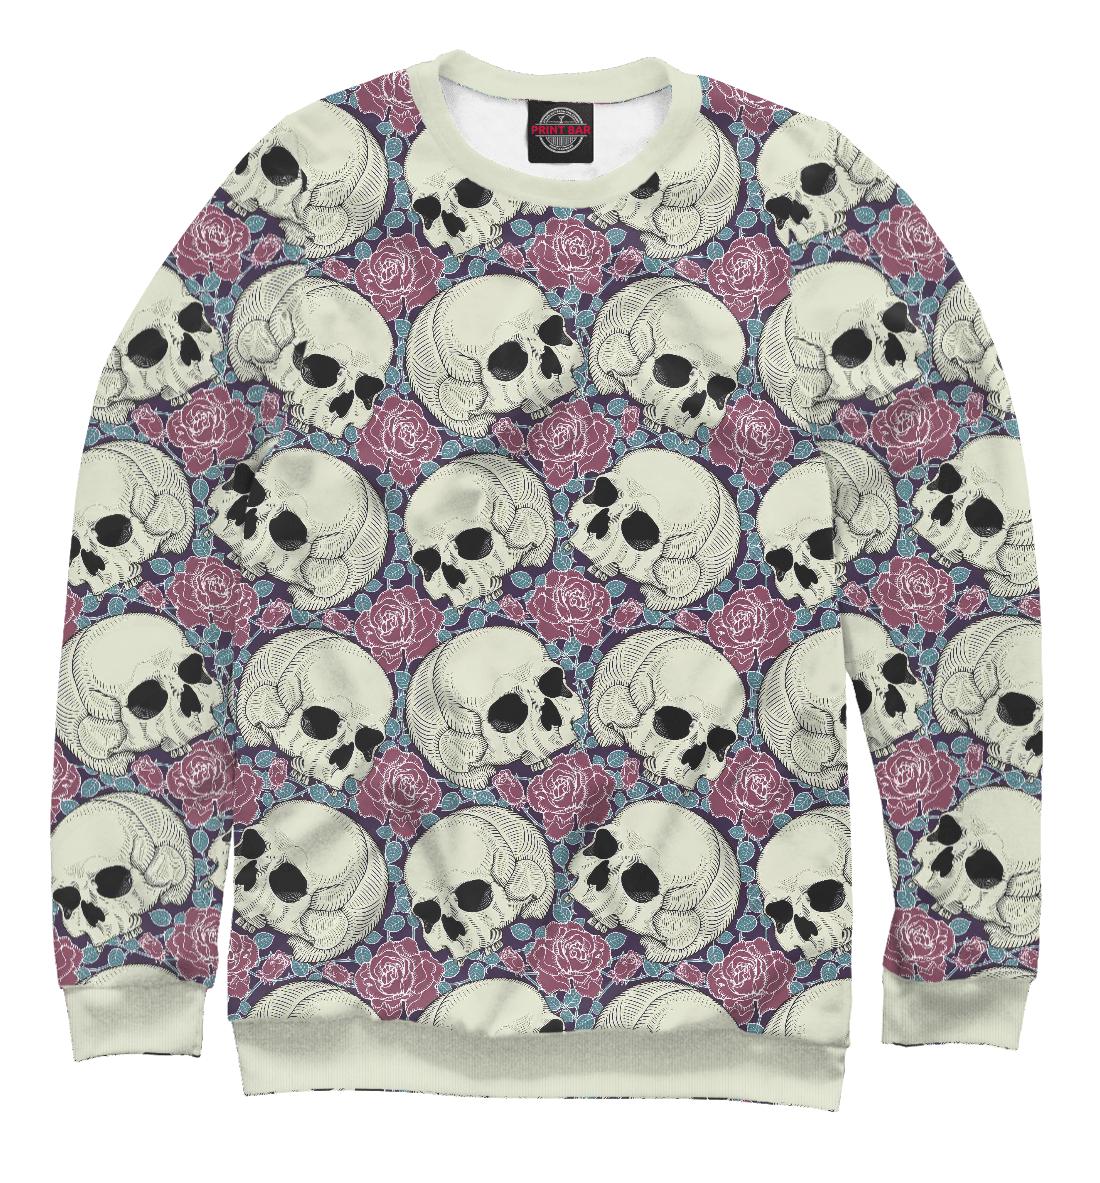 Купить Skull Garden, Printbar, Свитшоты, SKU-985908-swi-2